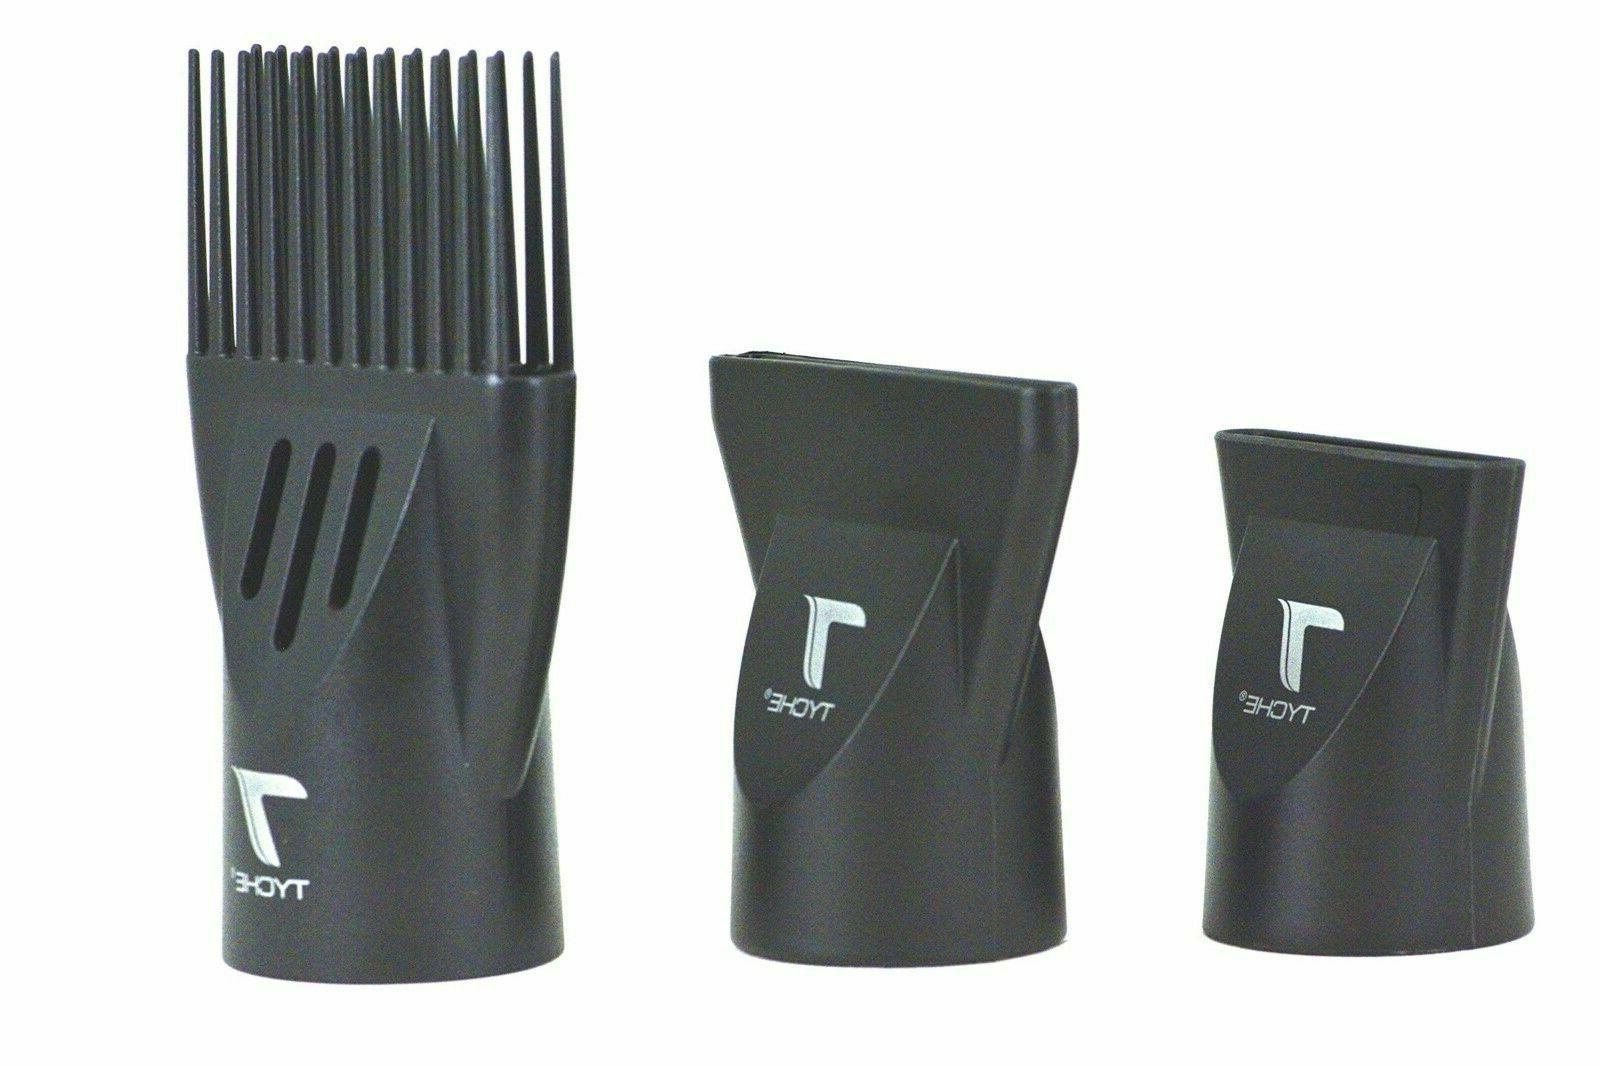 NICKA Professional Dryer Black 1 Year 3000 IONIC